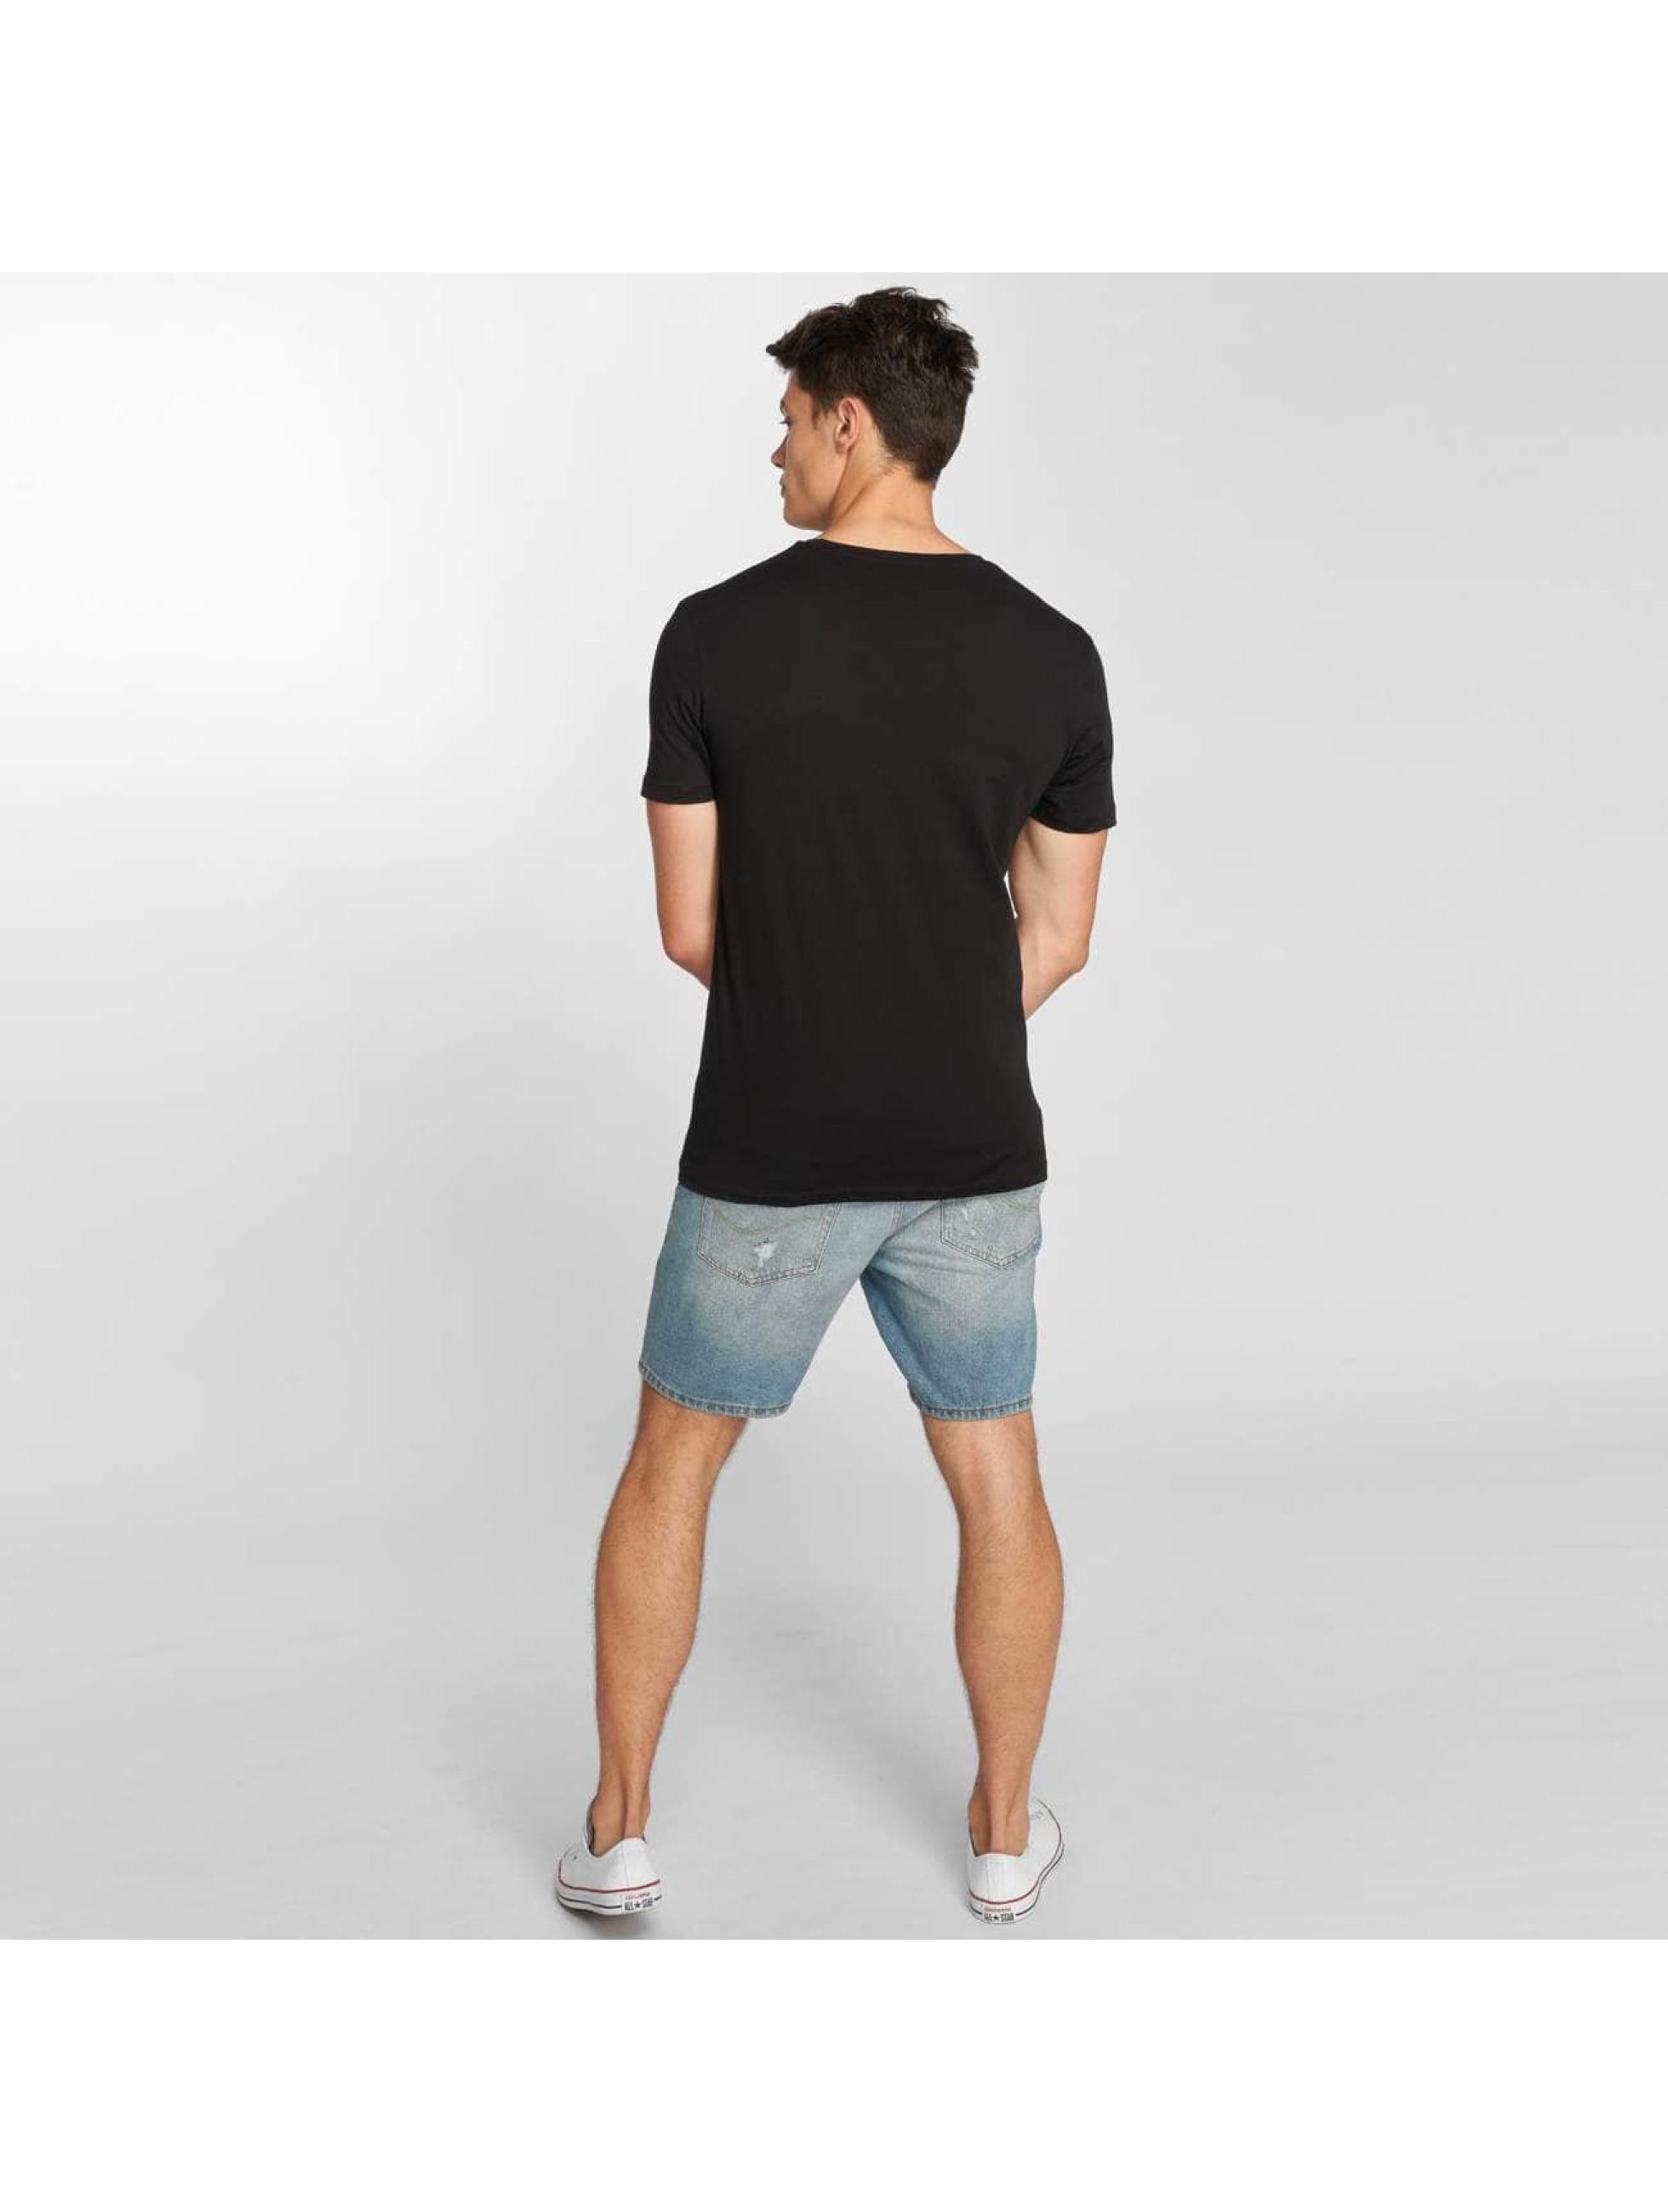 Lee T-skjorter Ultimate svart